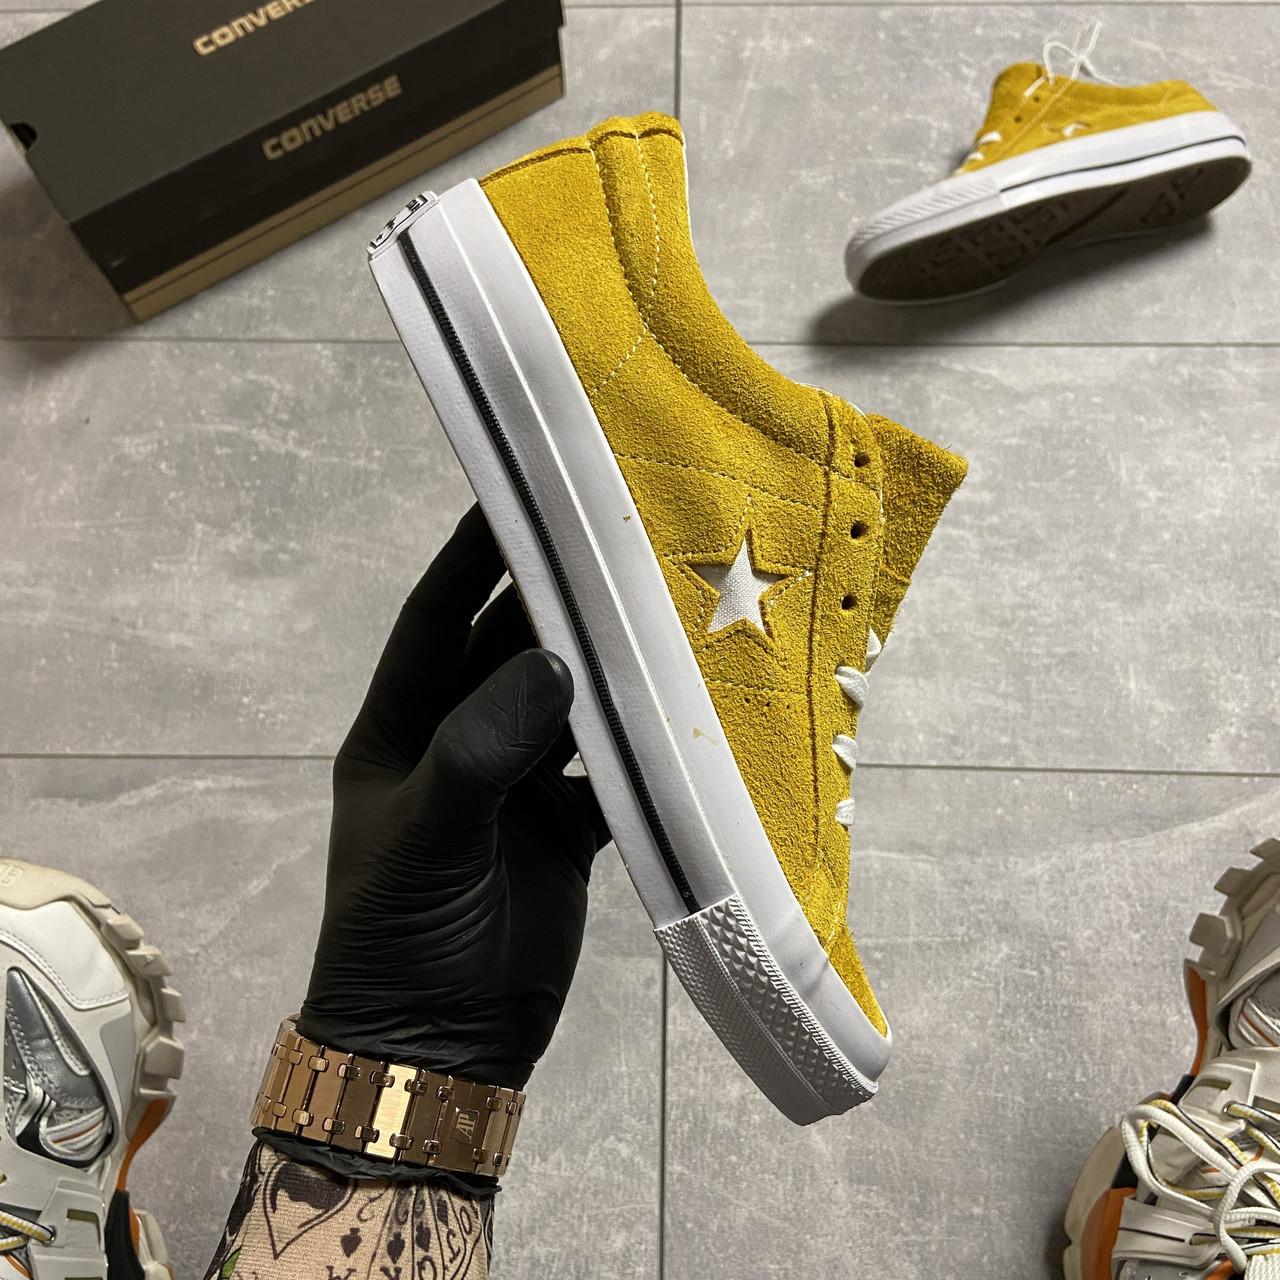 Кеды женские Converse One Star Premium Suede Yellow. Стильные женские кеды желтого цвета.